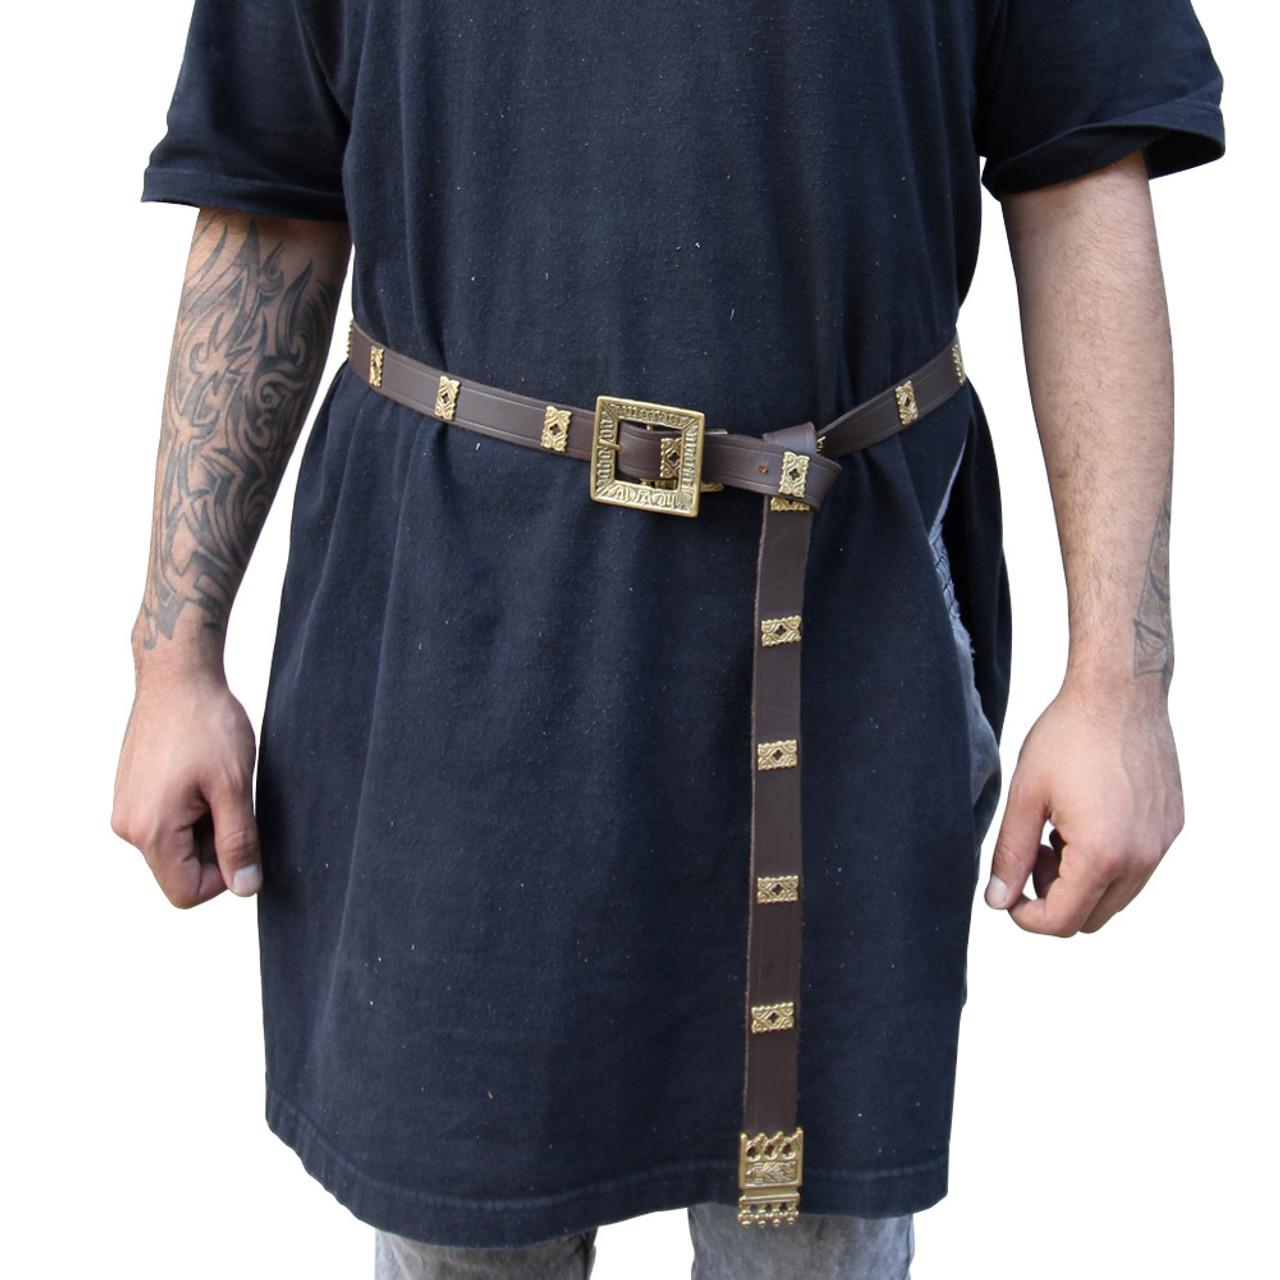 Quatrefoil Medieval Handmade Leather Belt